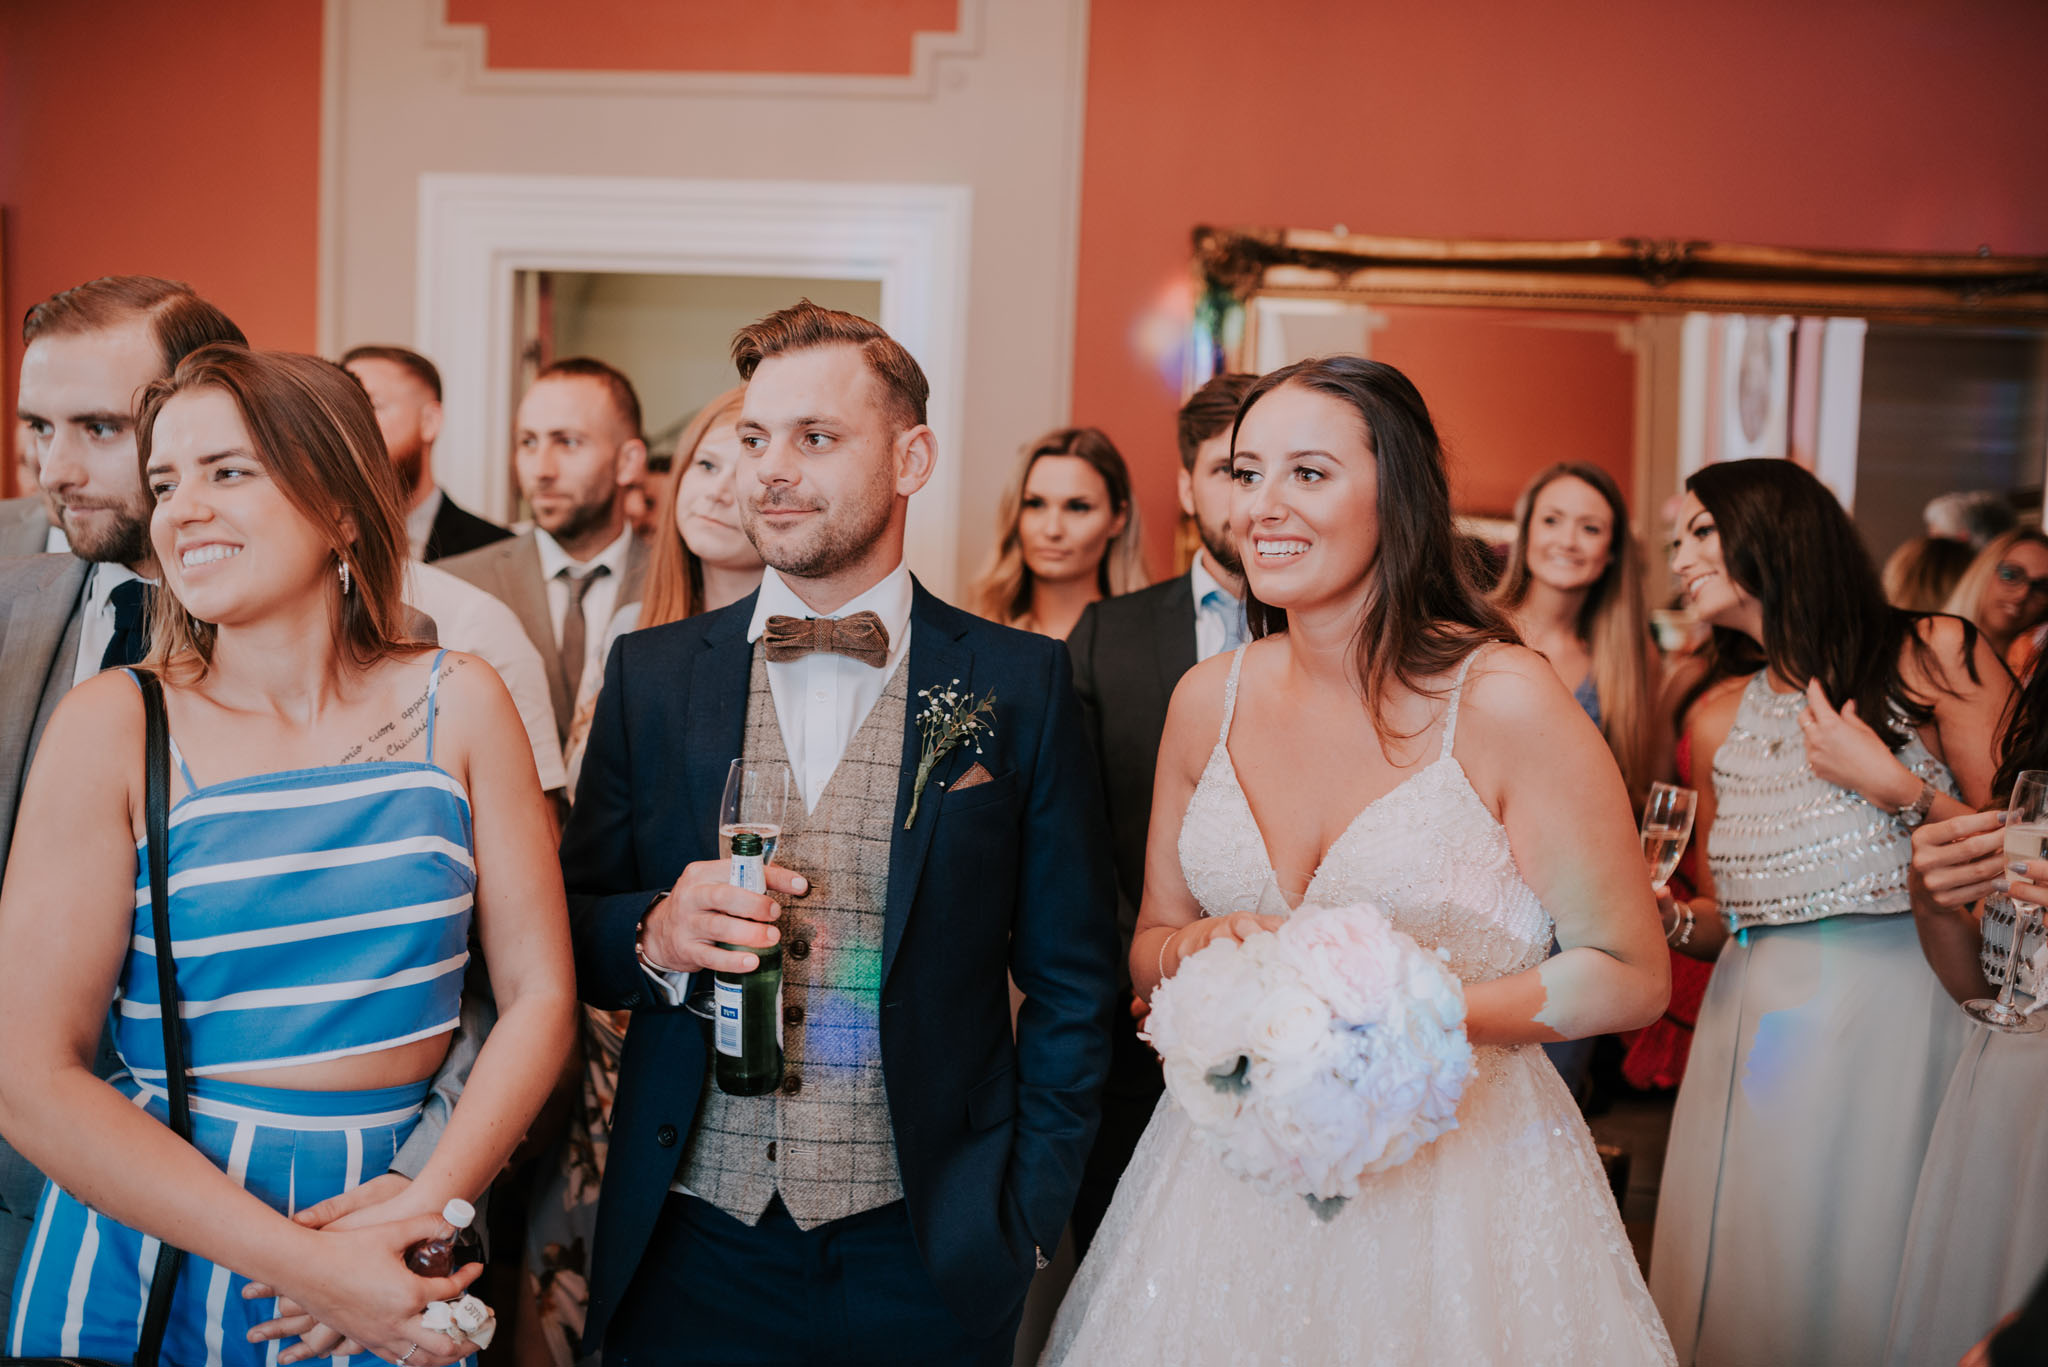 wedding-photographer-glewstone-court-hereford-scott-stockwell-photography406.jpg